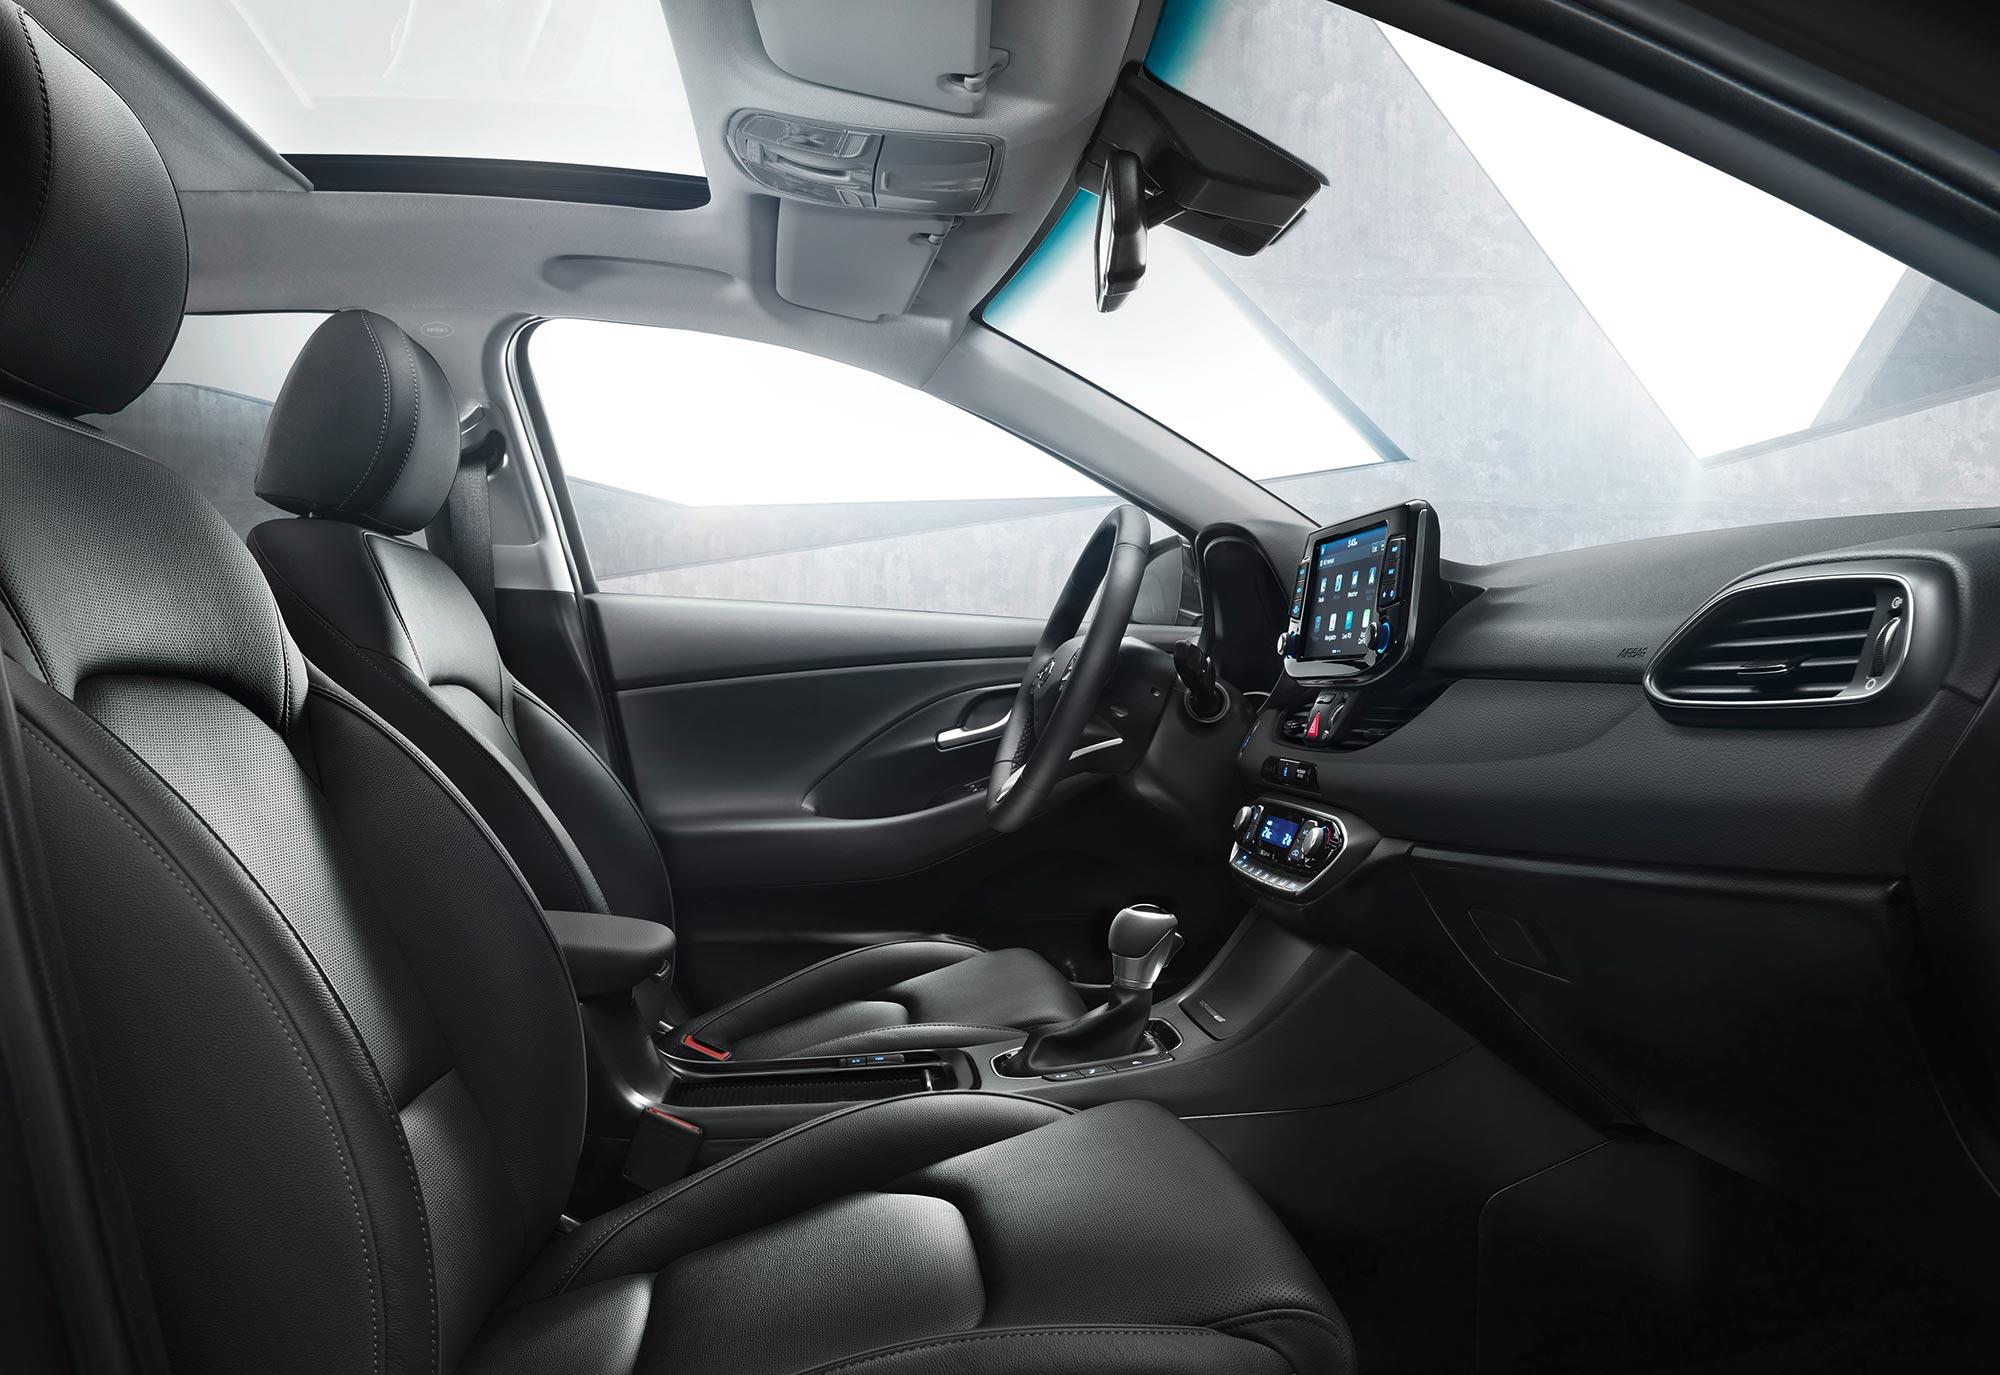 i30-wagon-interior-(2).jpg